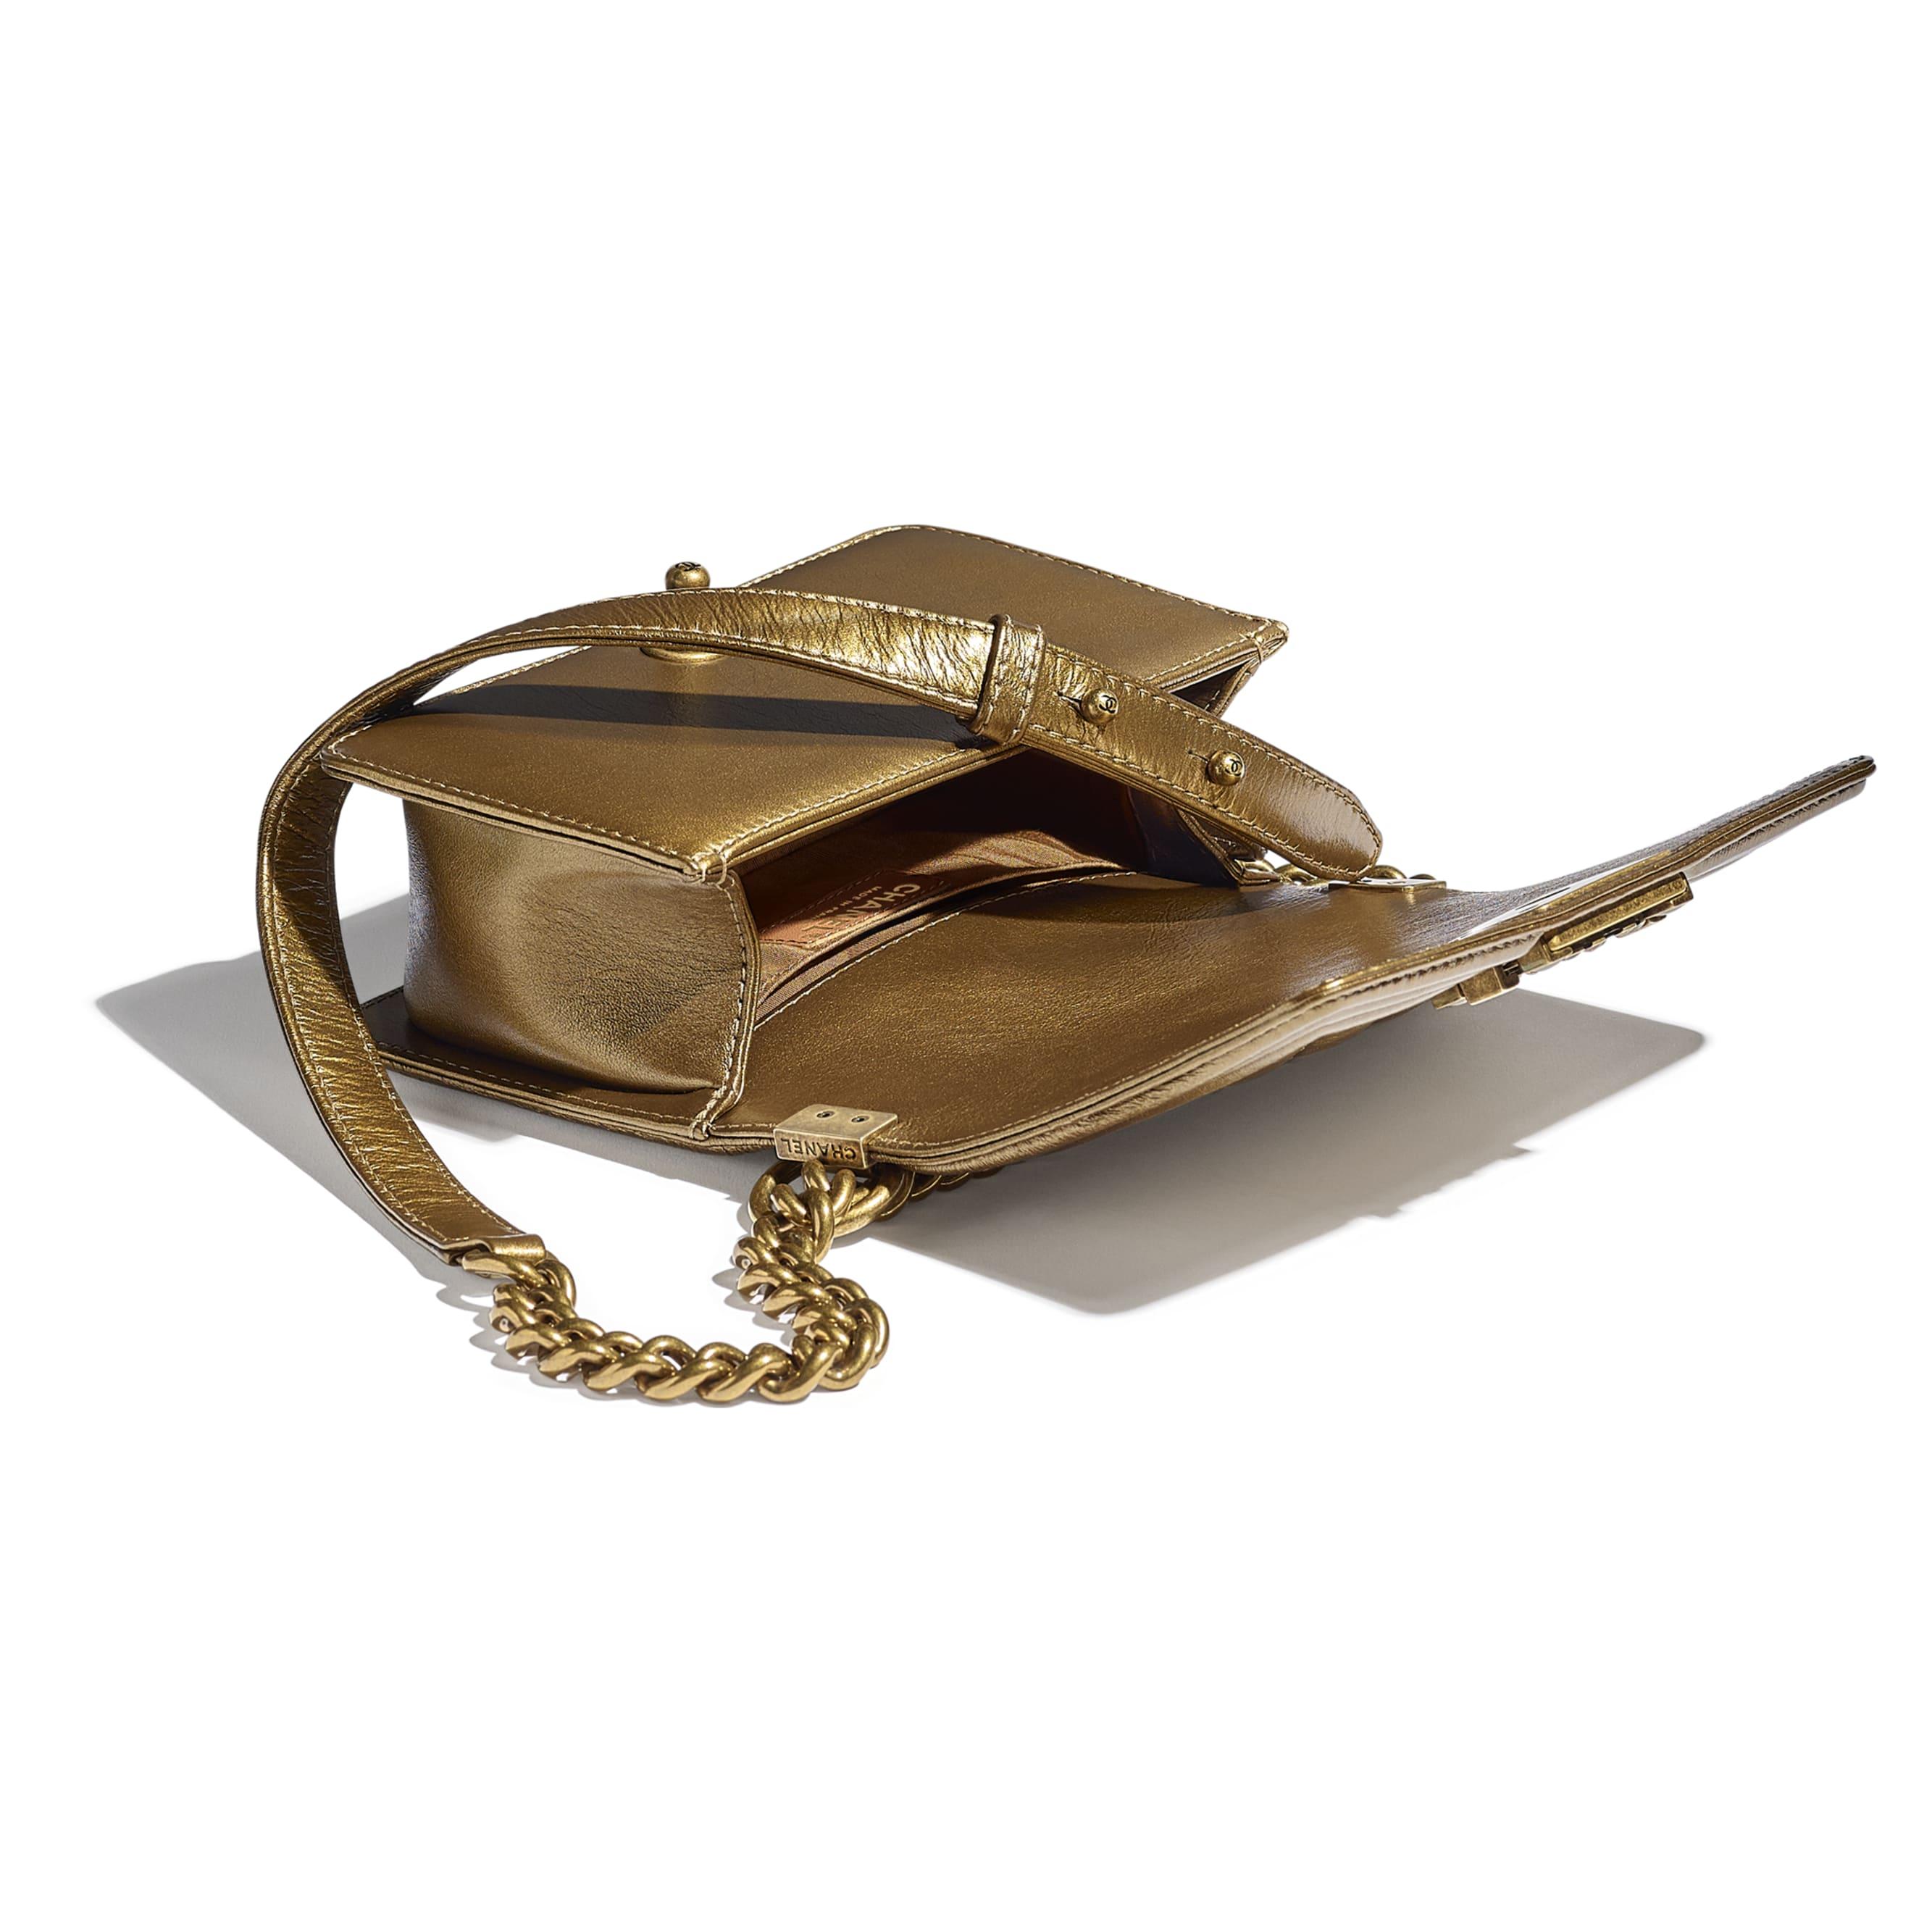 Small BOY CHANEL Handbag - Gold - Metallic Calfskin, Enamel & Gold-Tone Metal - CHANEL - Other view - see standard sized version